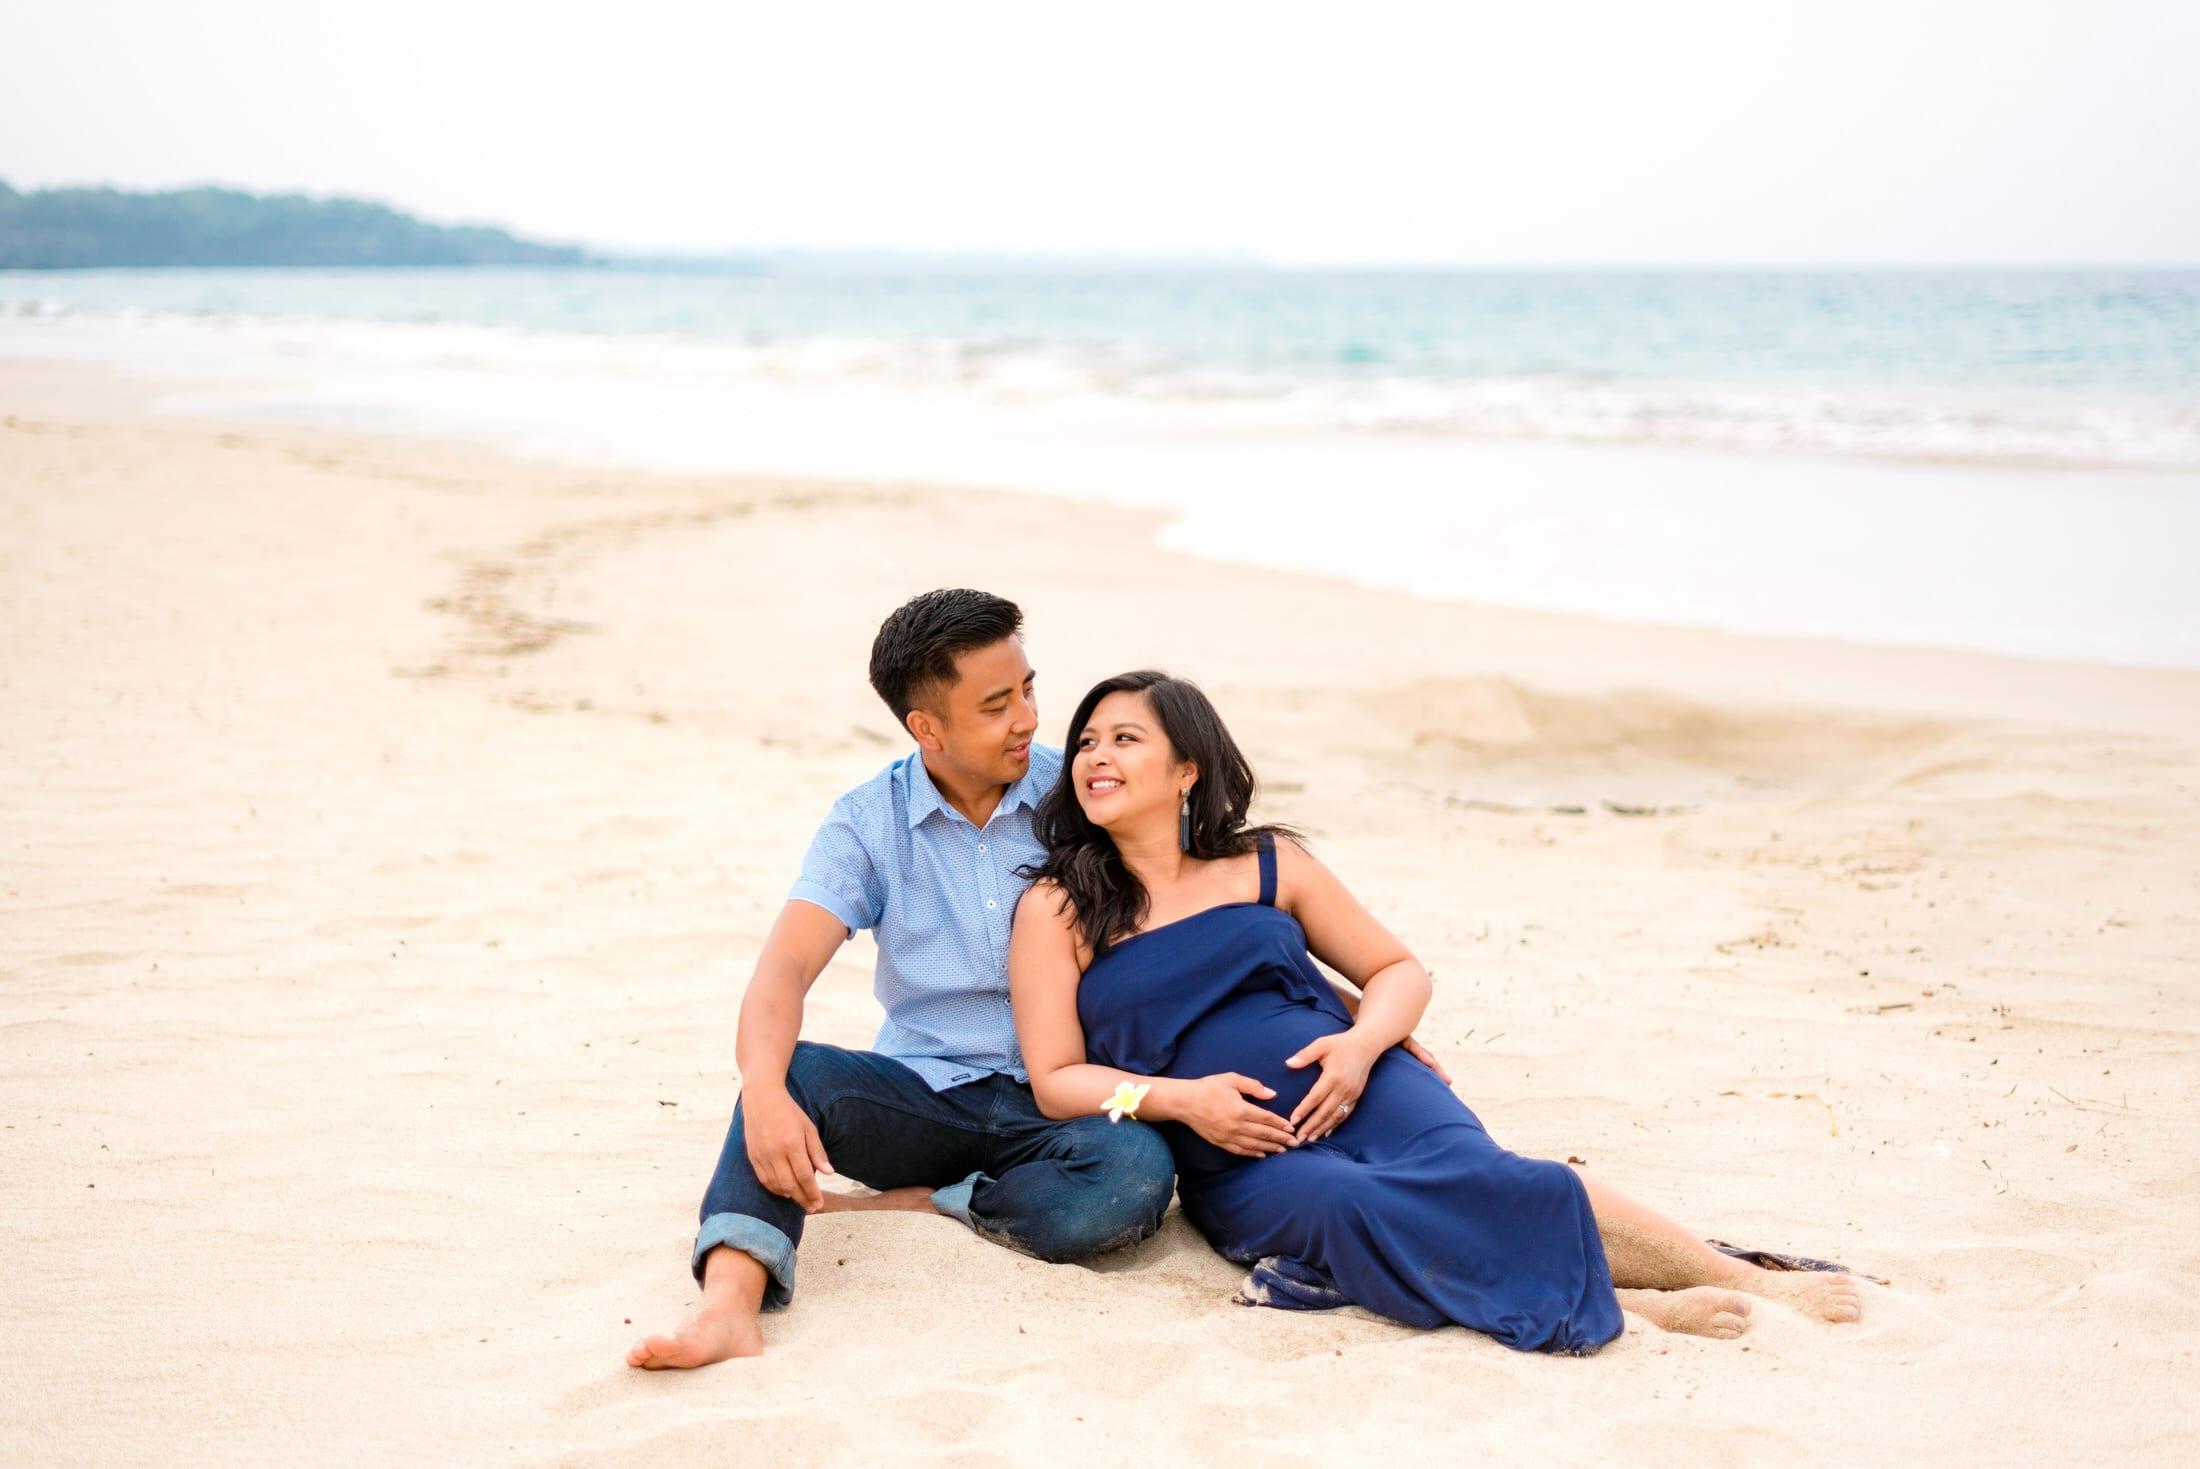 Hawaii-Cloudy-Maternity-Photographer22-8.jpg